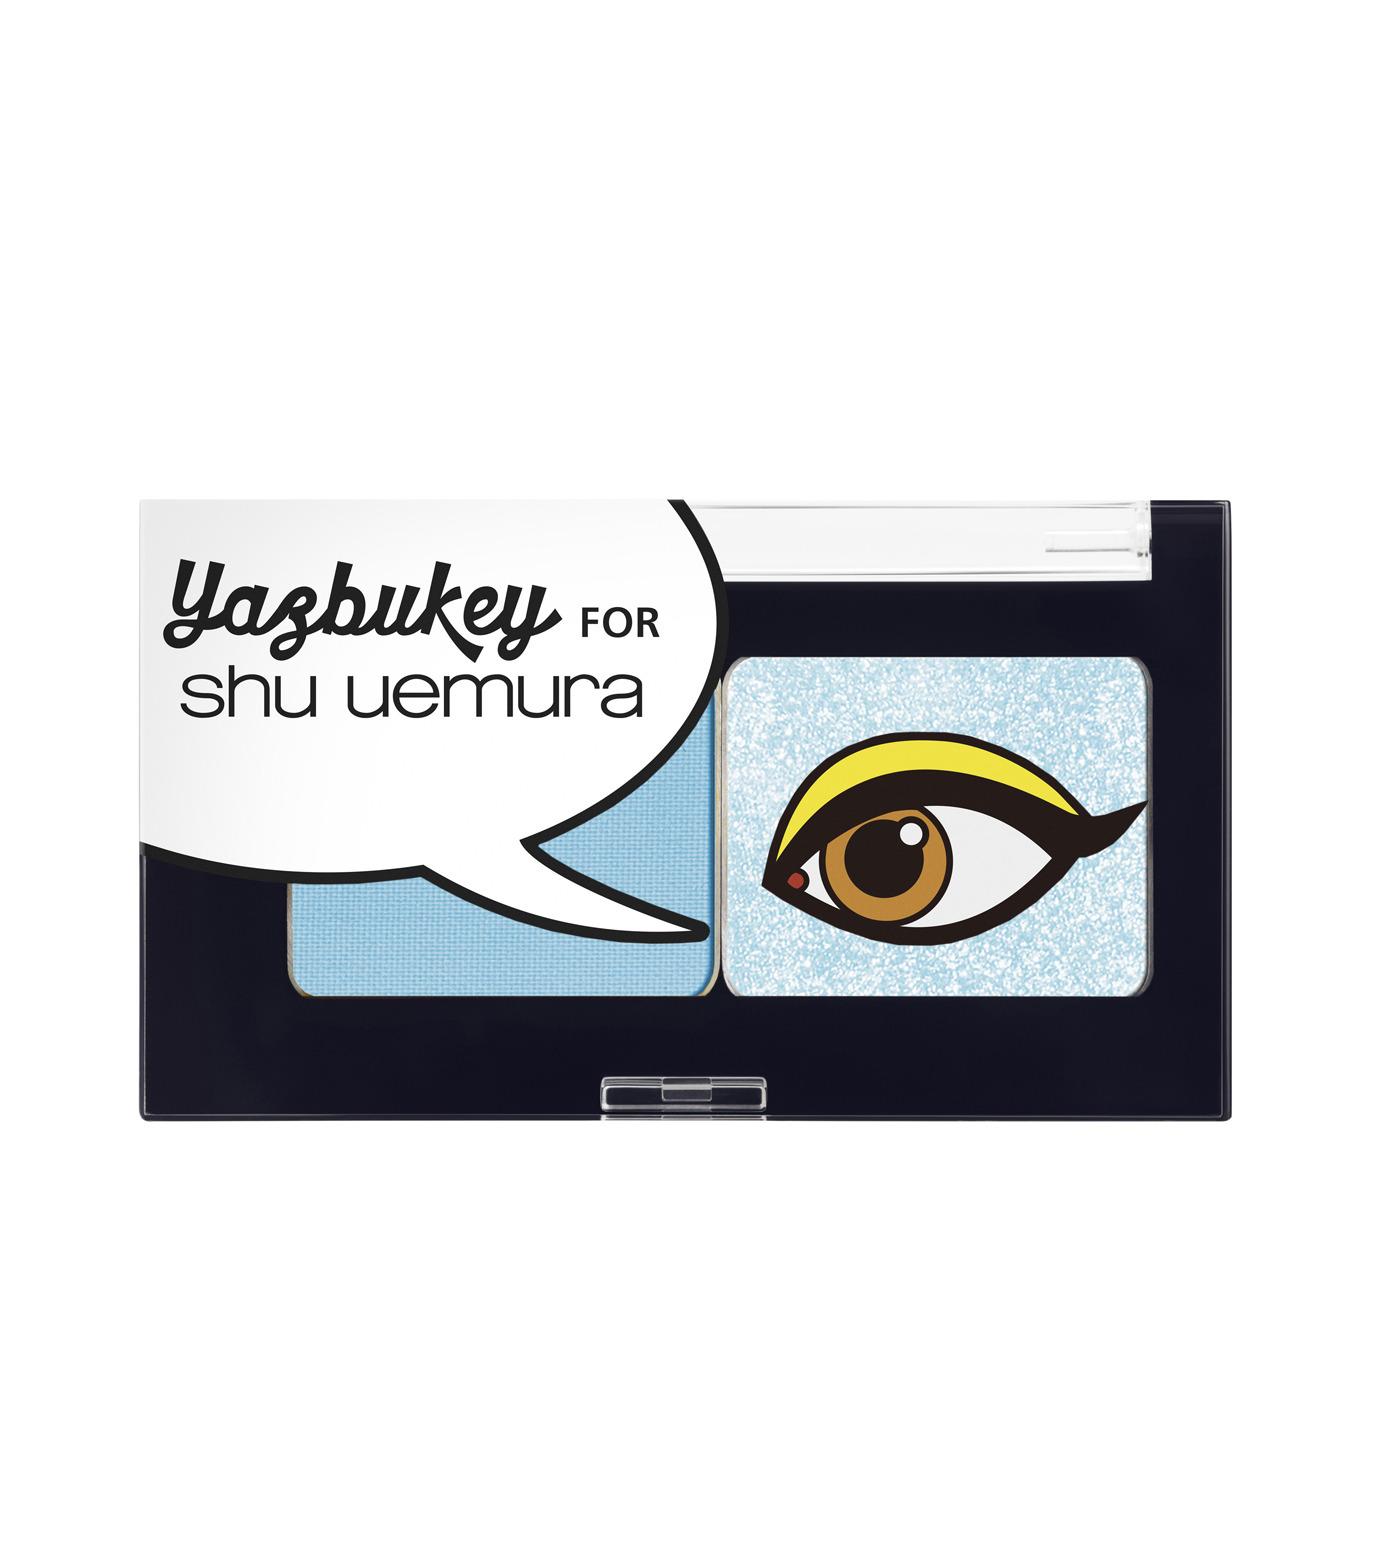 Yazbukey for shu uemura(ヤズブキー for シュウ ウエムラ)のDuo Eye Shadow -Blue--BLUE(MAKE-UP/MAKE-UP)-F5621500-900-92 拡大詳細画像1